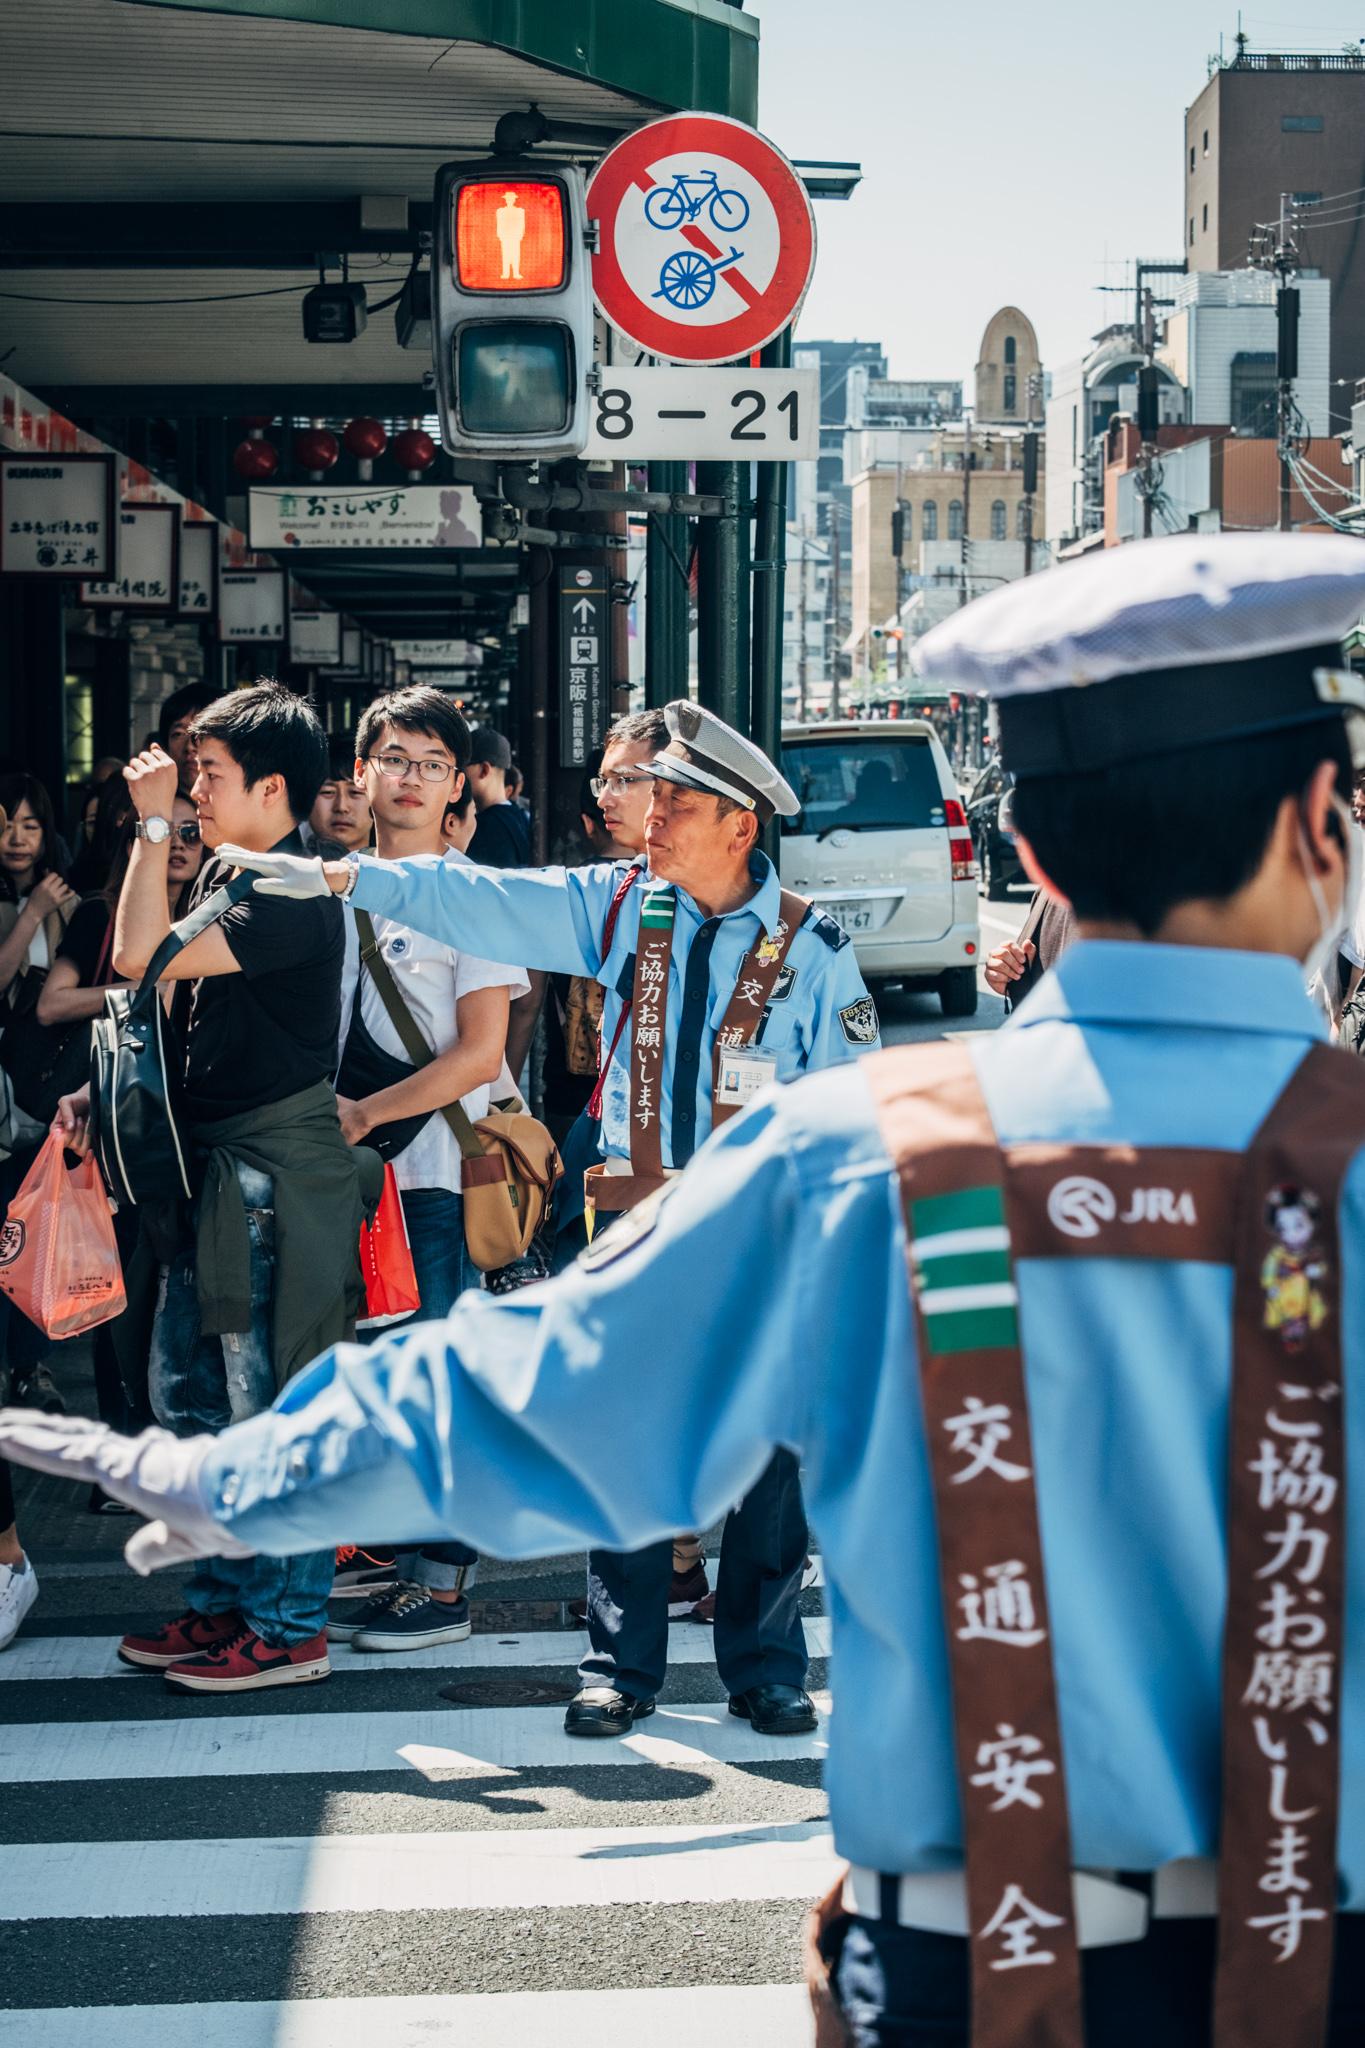 河原町通 – Kawaramachi Dori, Kyoto